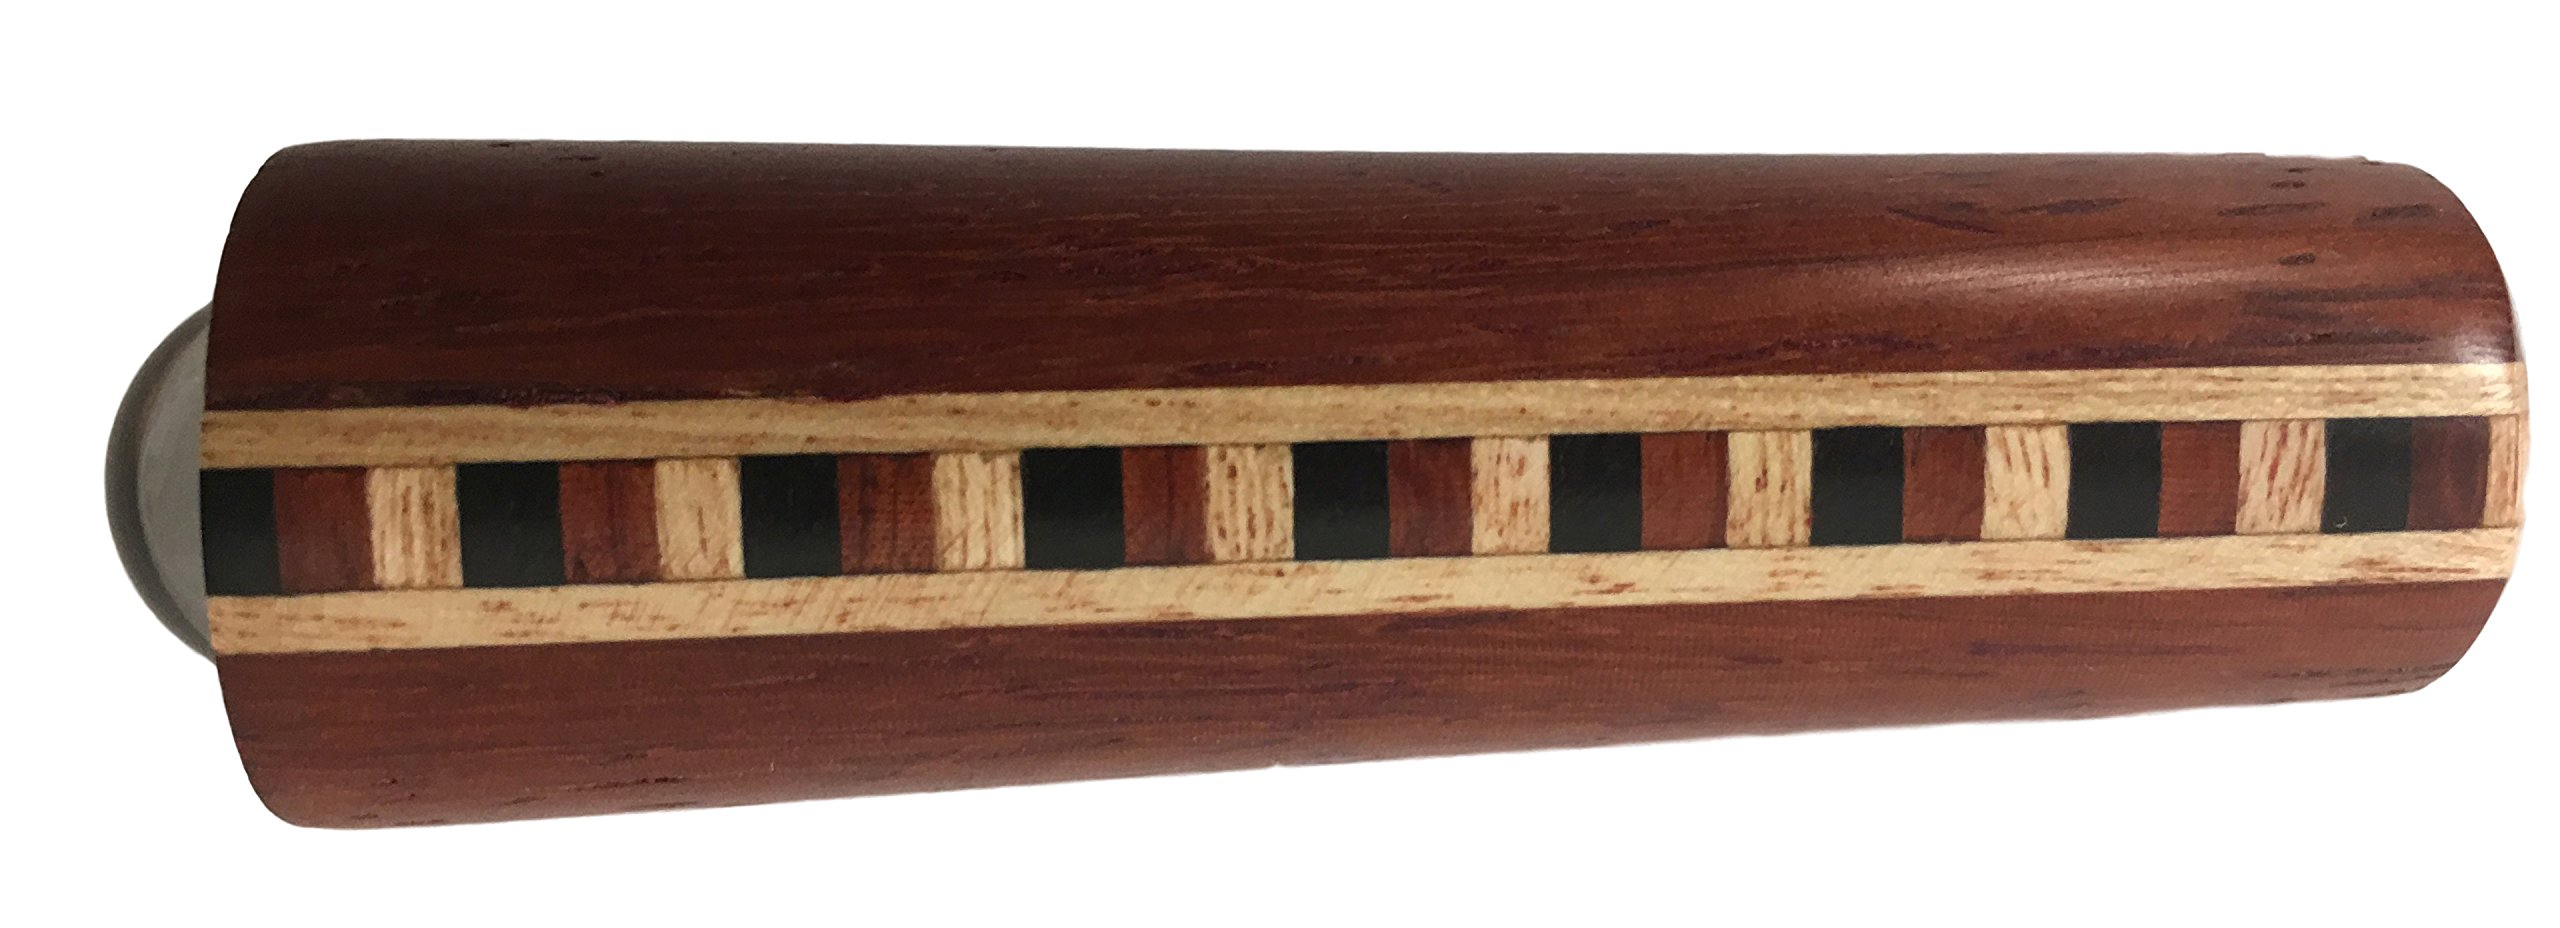 N & J Kaleidoscope Teleidoscope in Solid Padauk Wood, Mini 3 Inch, Inlaid Padauk, Ebony, and Jalneem by N & J